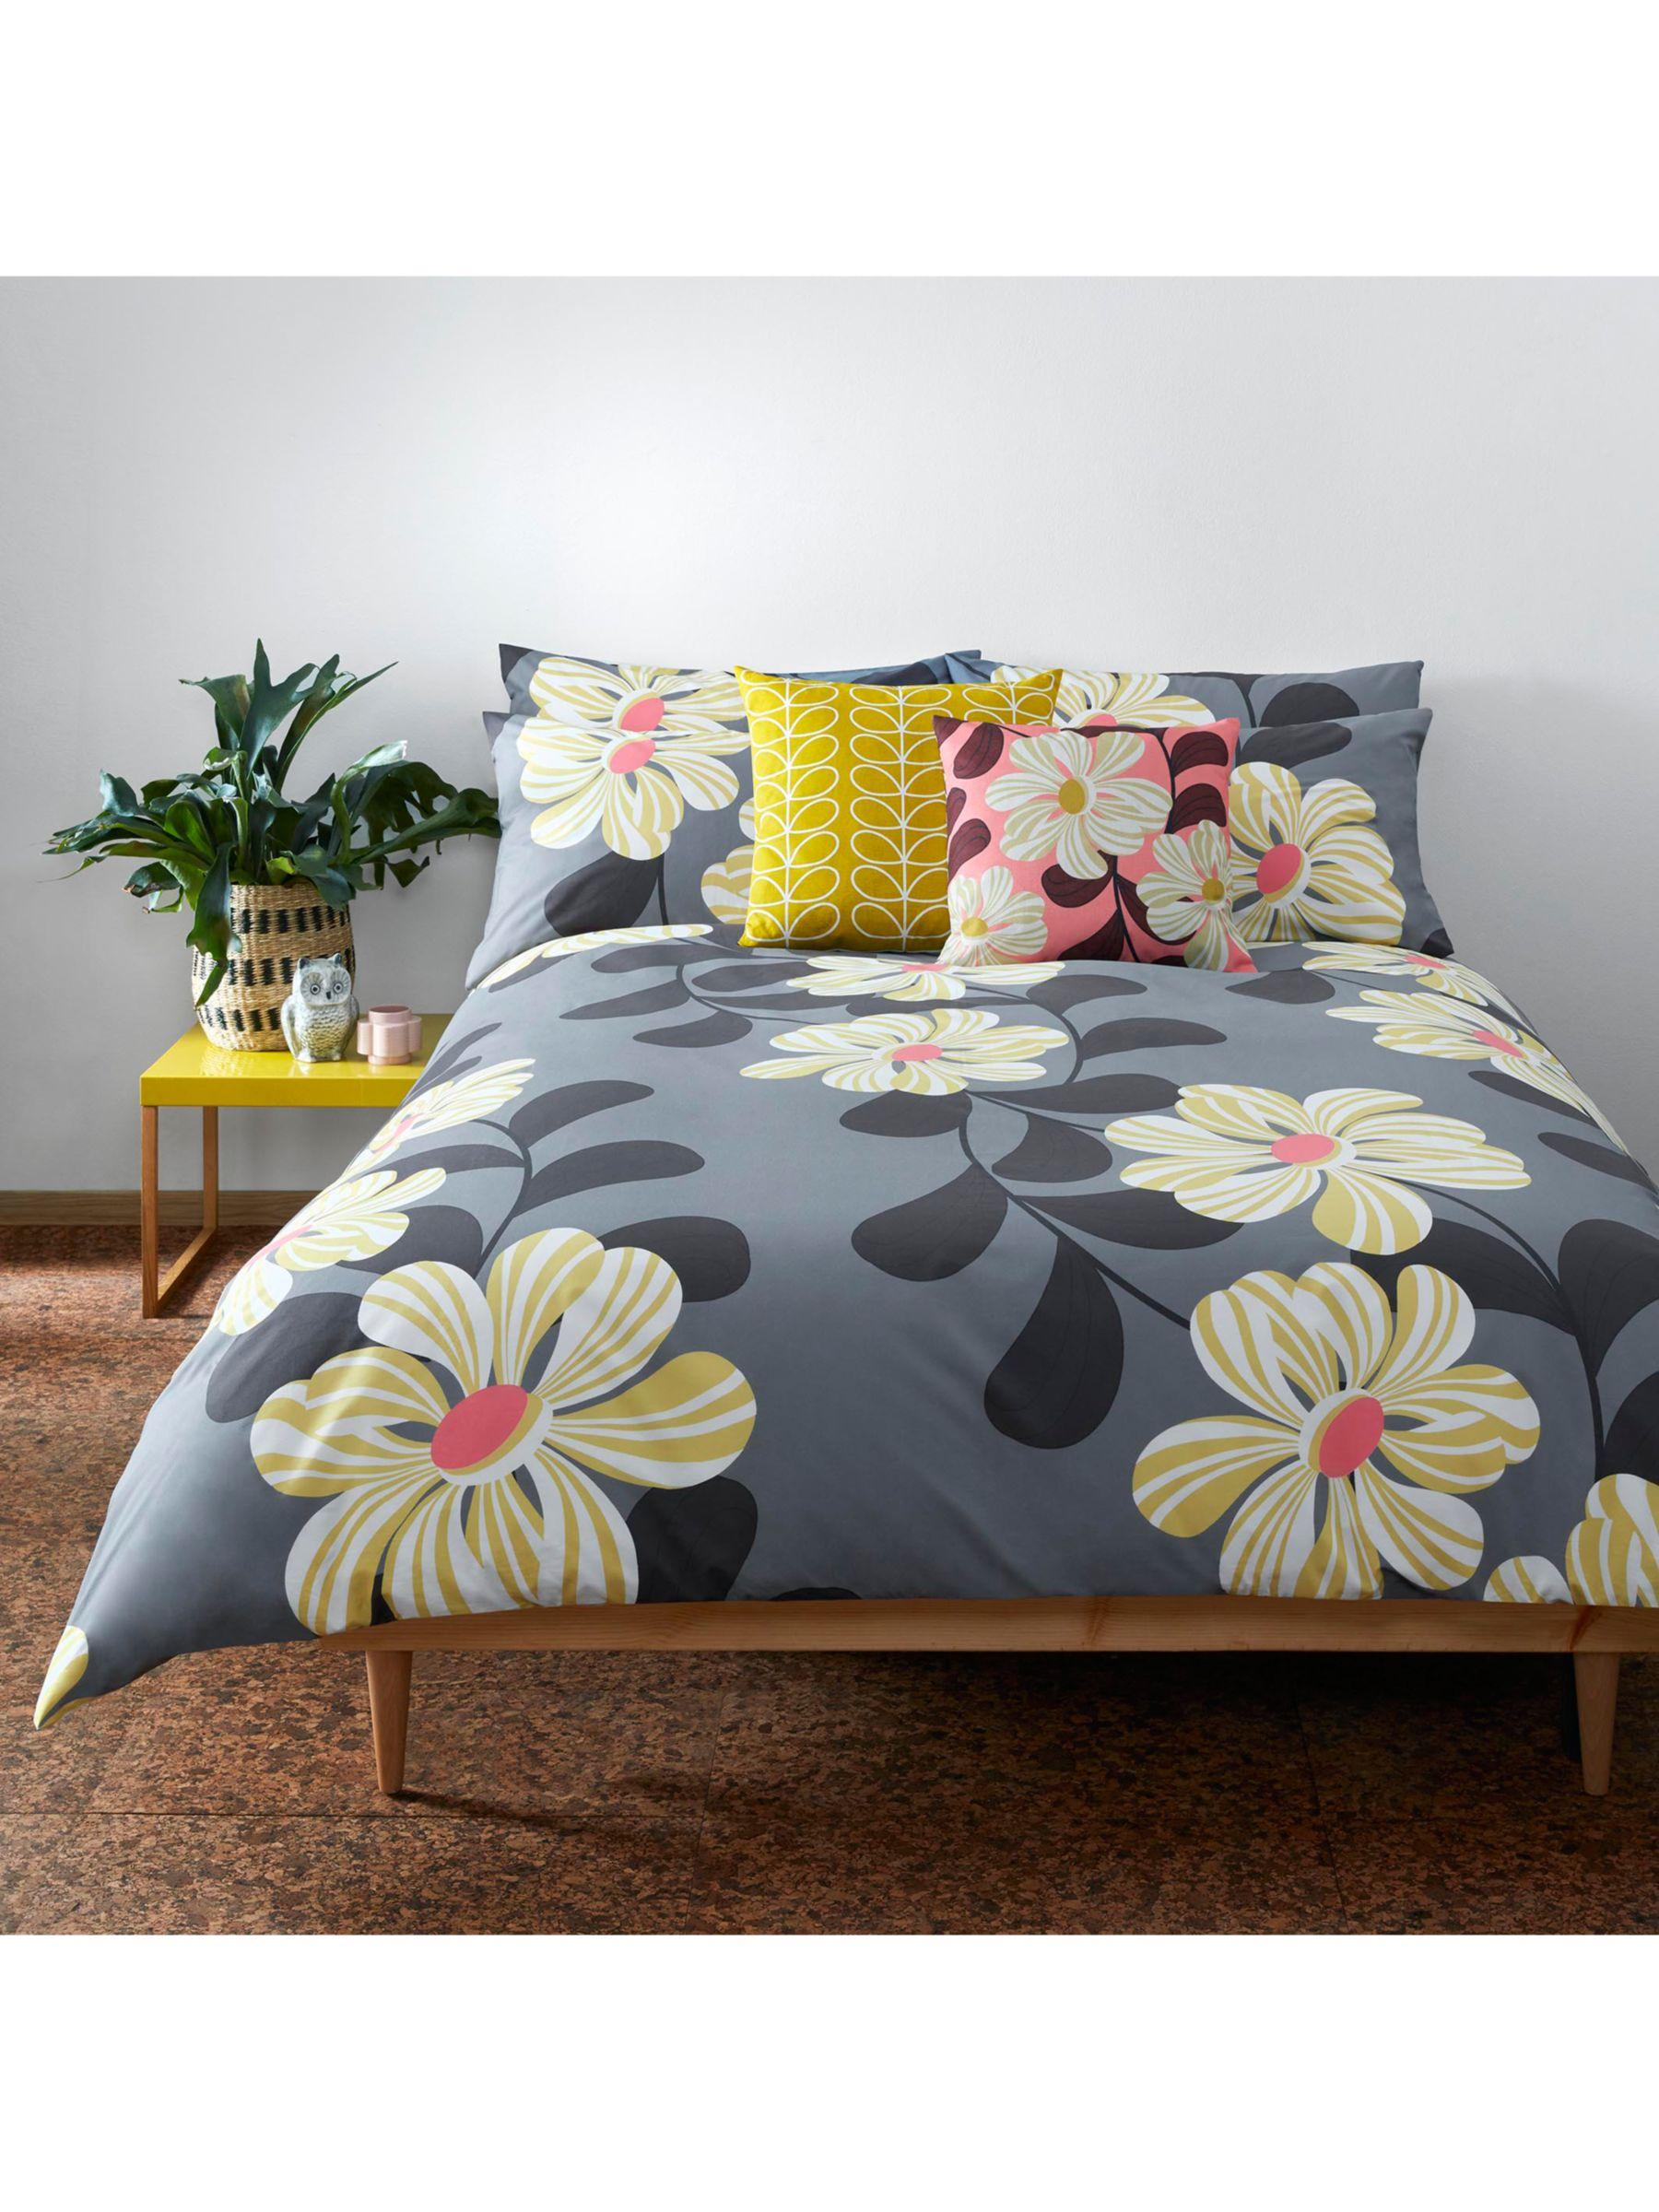 Orla Kiely Orla Kiely Acapulco Bedding